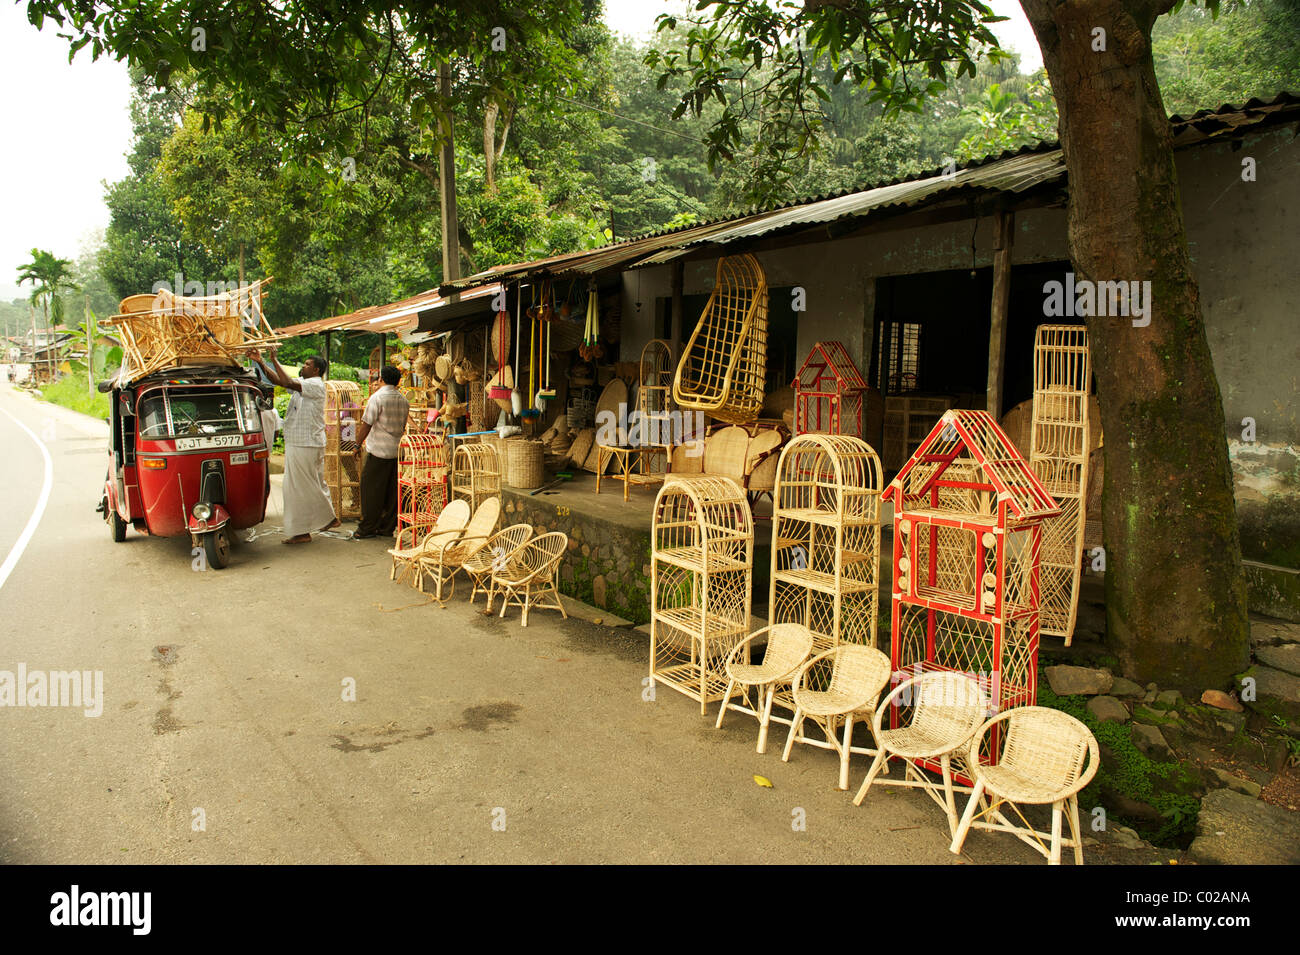 Furniture shops in harare - A Roadside Cane Furniture Shops Sri Lanka Stock Image